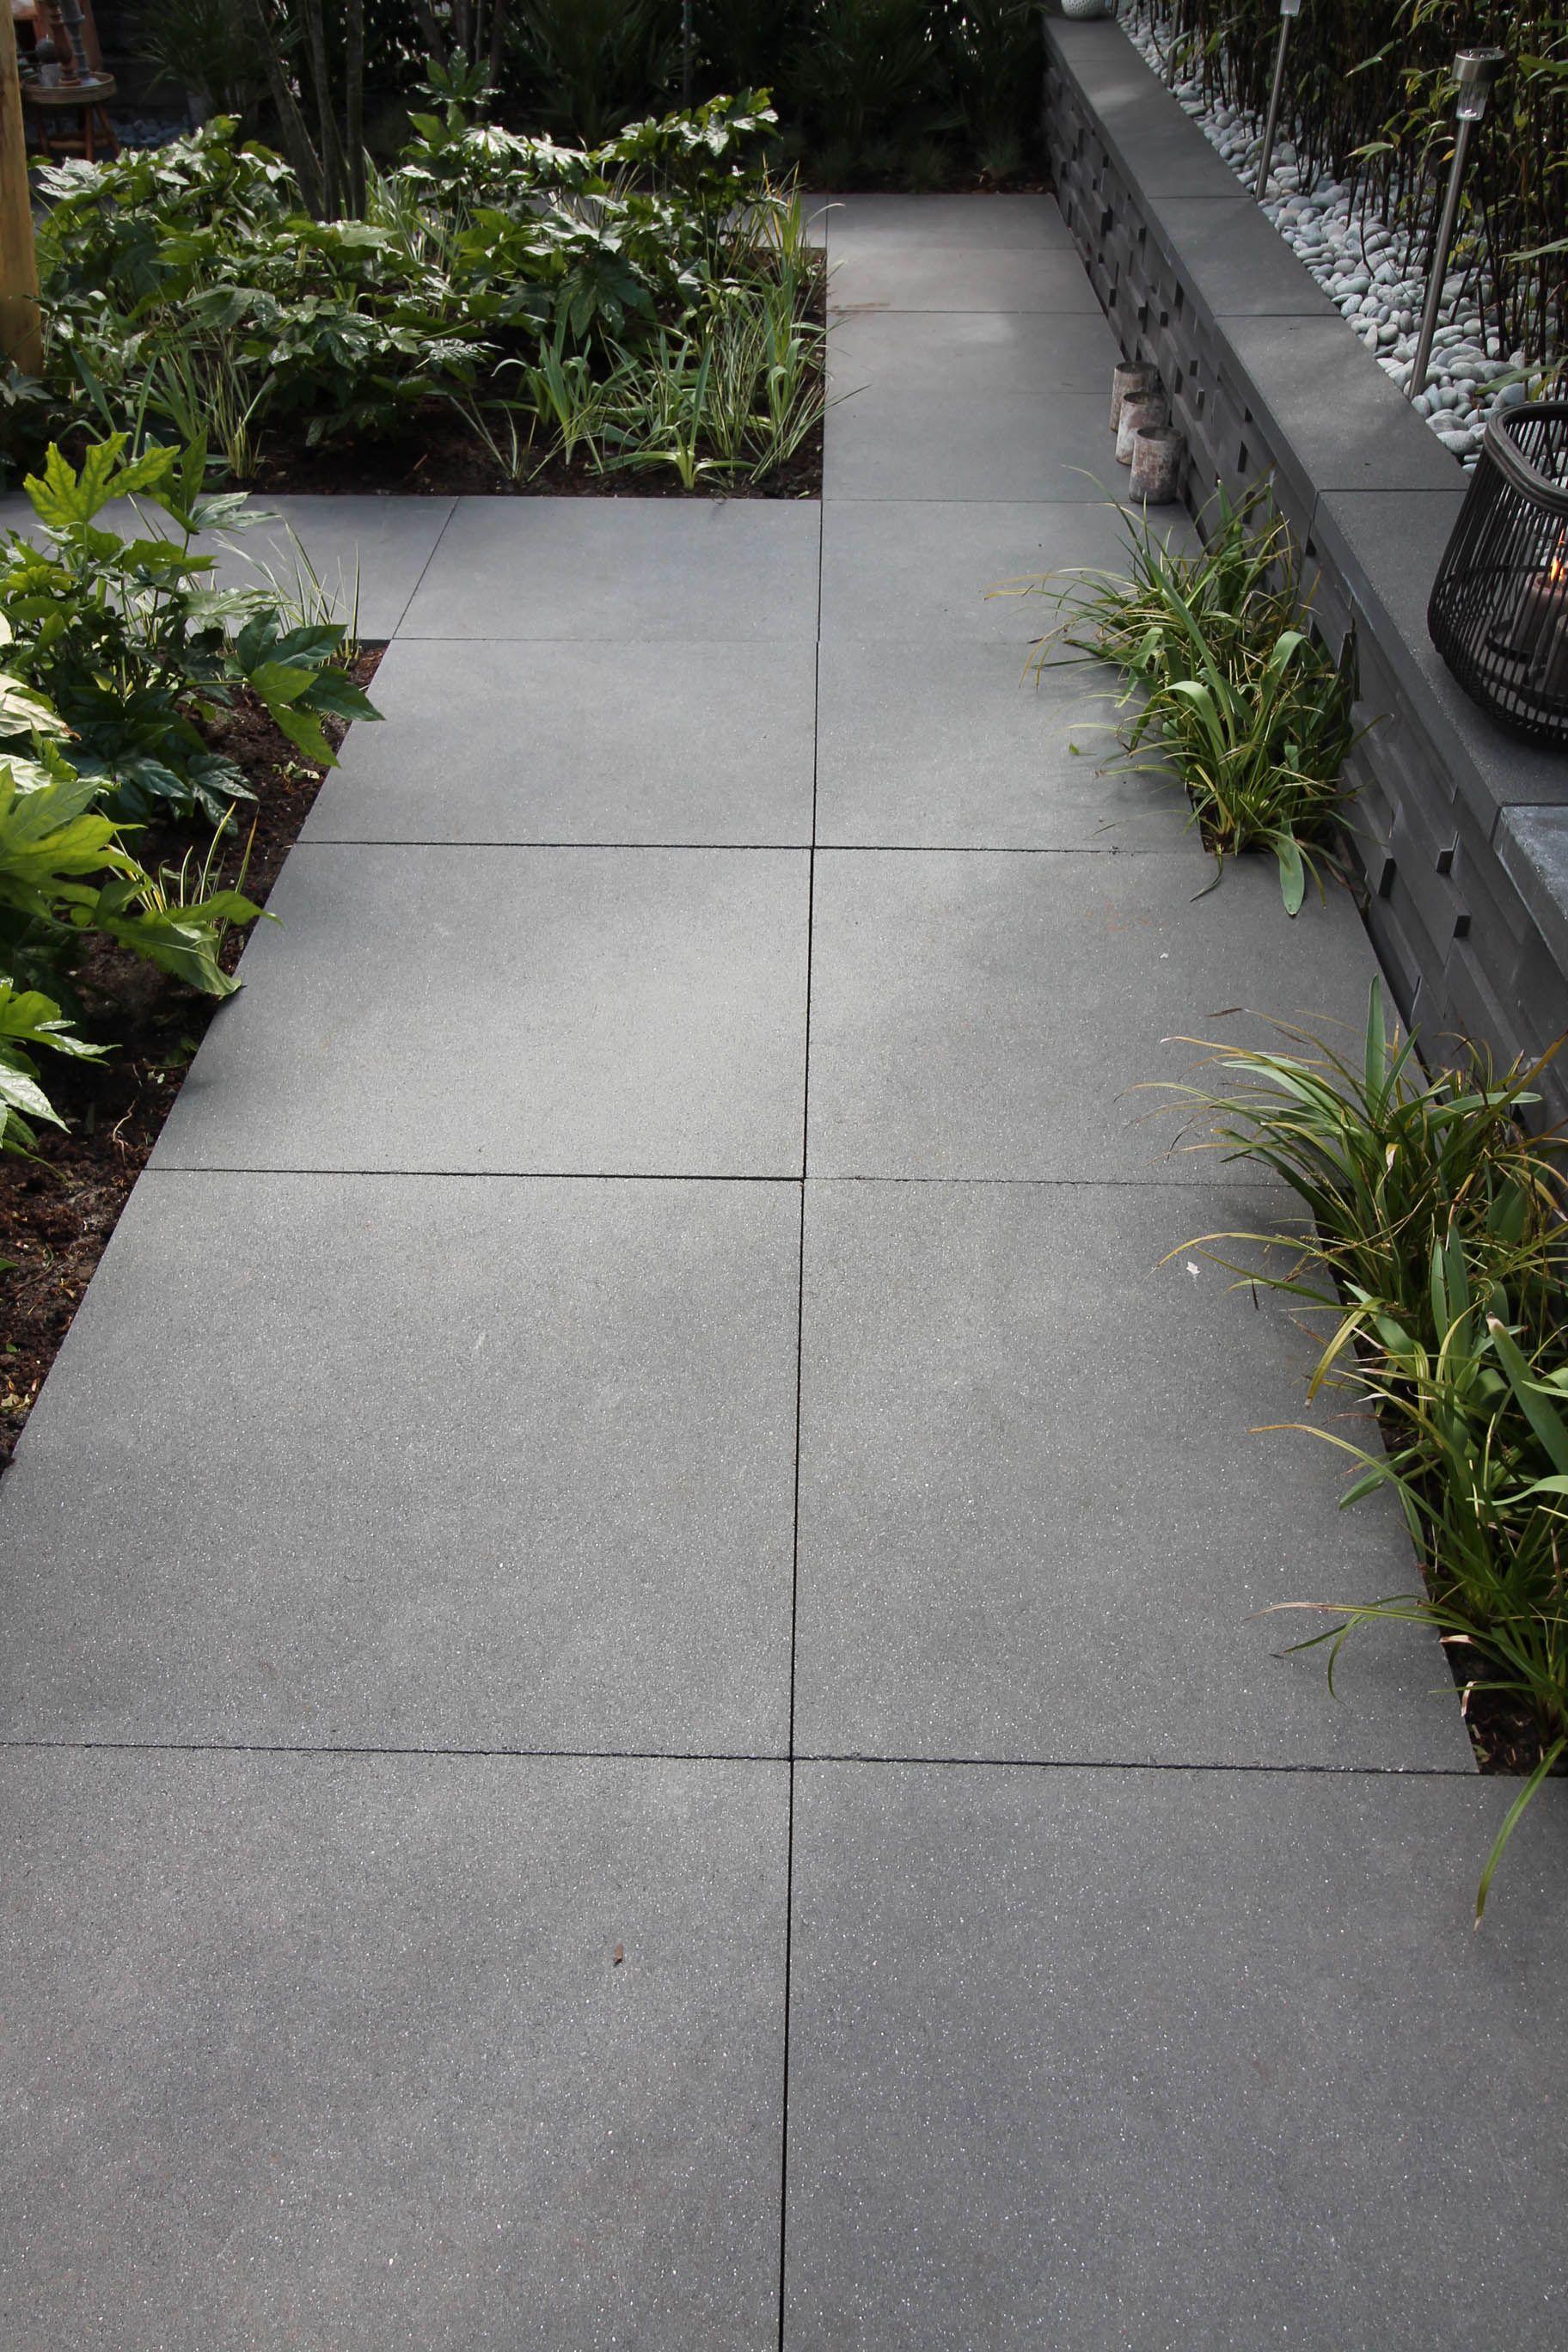 Terrastegels 80x80 Beton.Geostretto Plus Cannobio Terrastegel 4 Cm Dikte In 5 Maten Met Deklaag